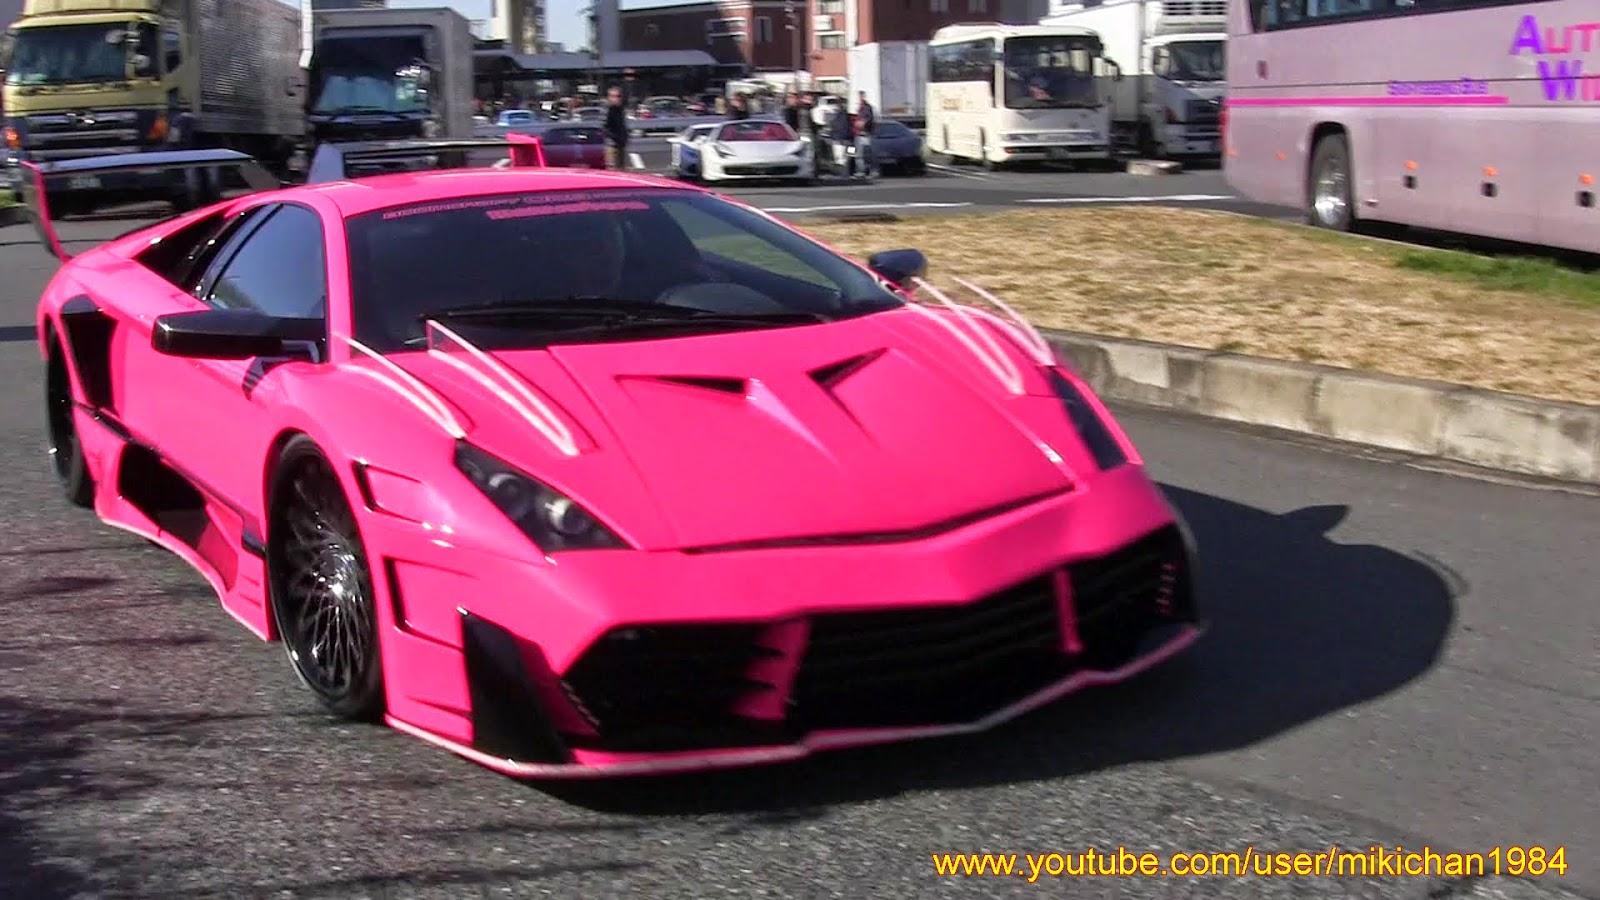 This Pink Lamborghini Veneno Wannabe Was A Real Murcielago